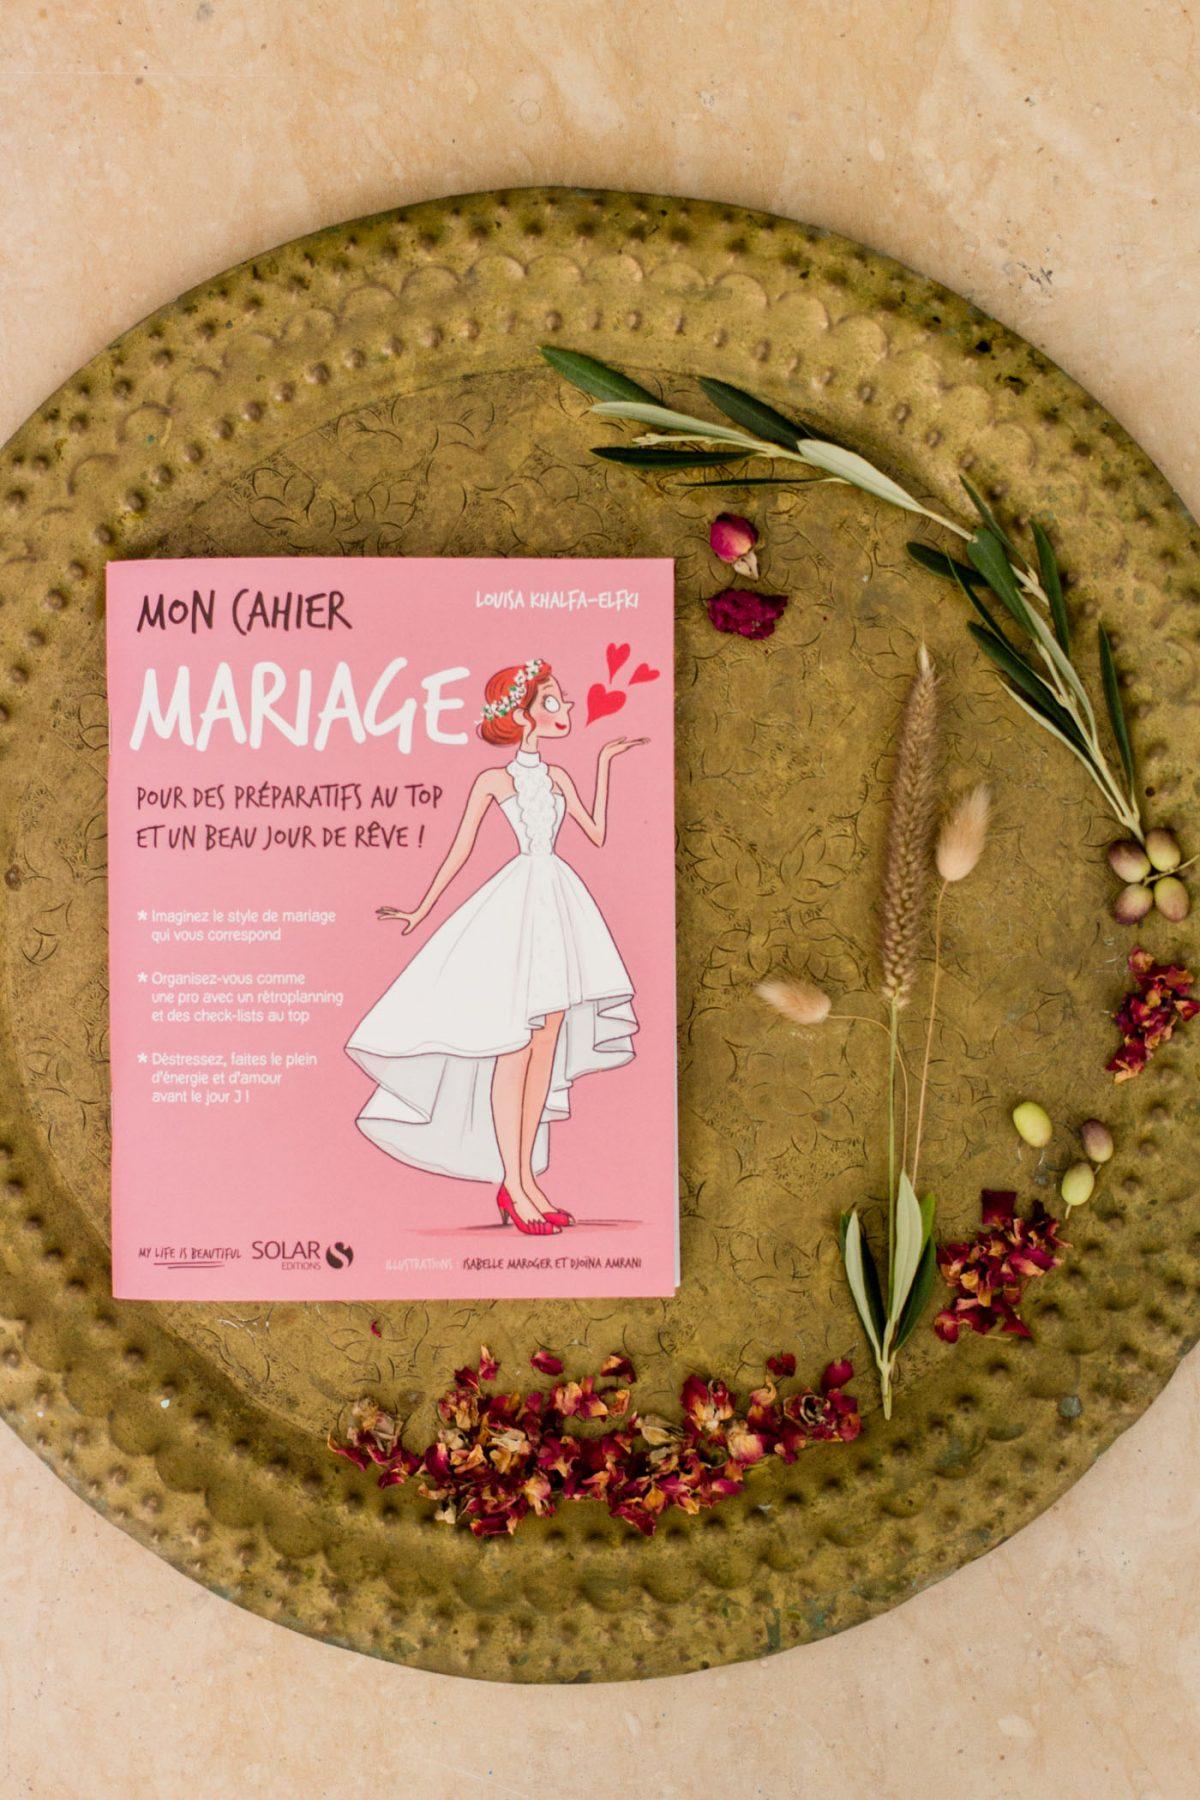 Mon cahier Mariage - Louisa Khalfa-Elfki | Editions Solar - My life is beautiful | La Mariée Sous Les Etoiles